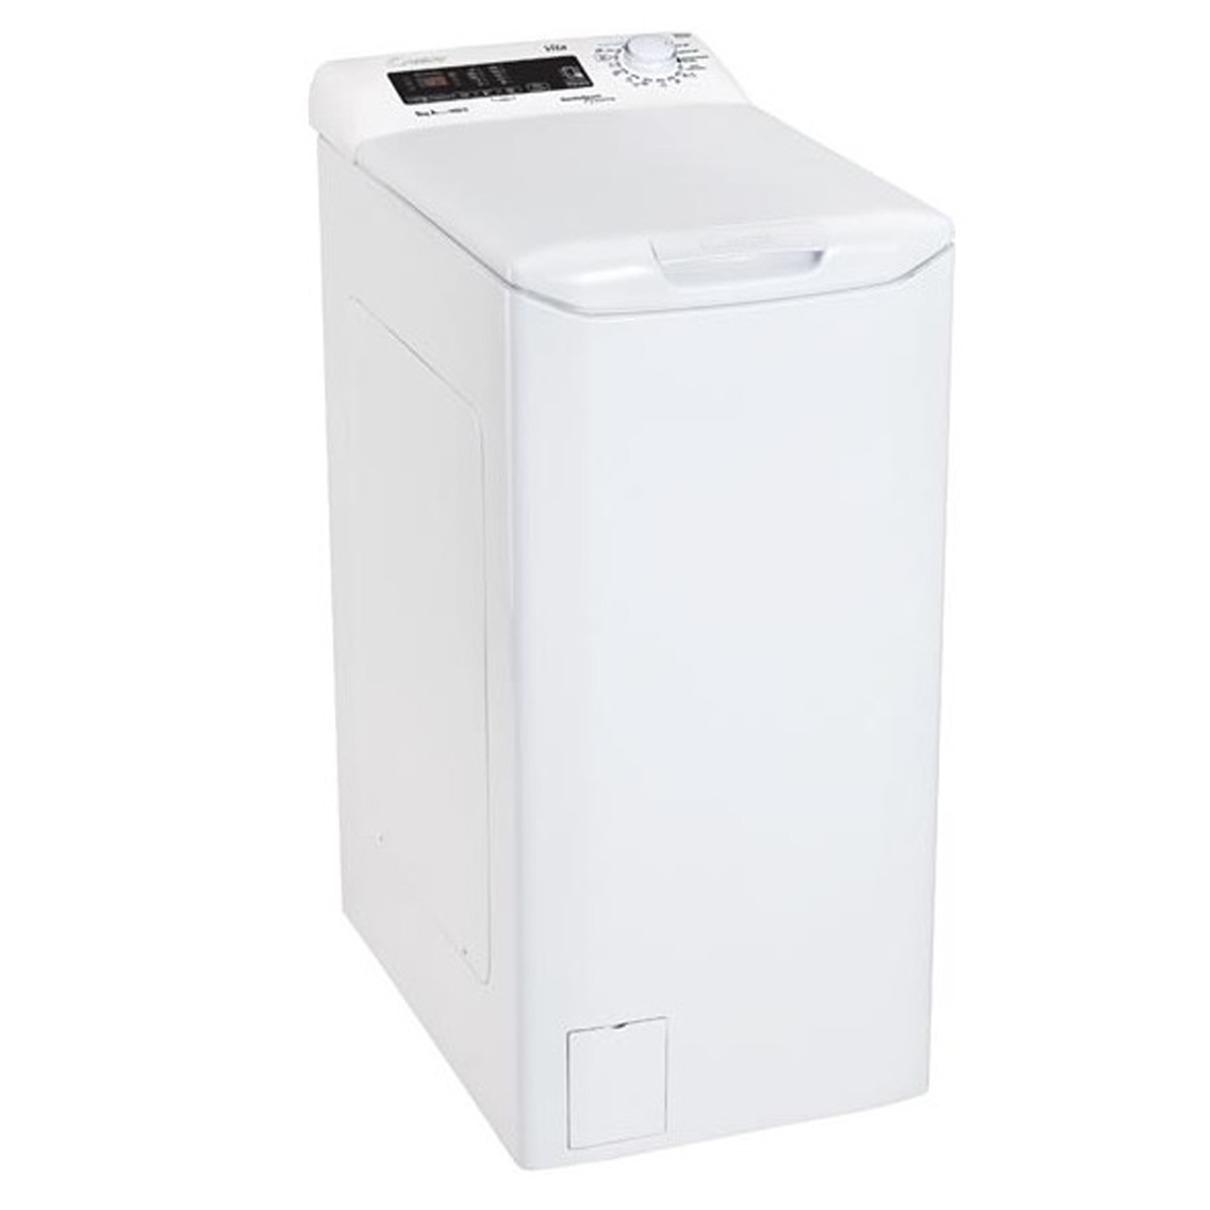 Candy wasmachine bovenlader CVST G384DM-S - Prijsvergelijk